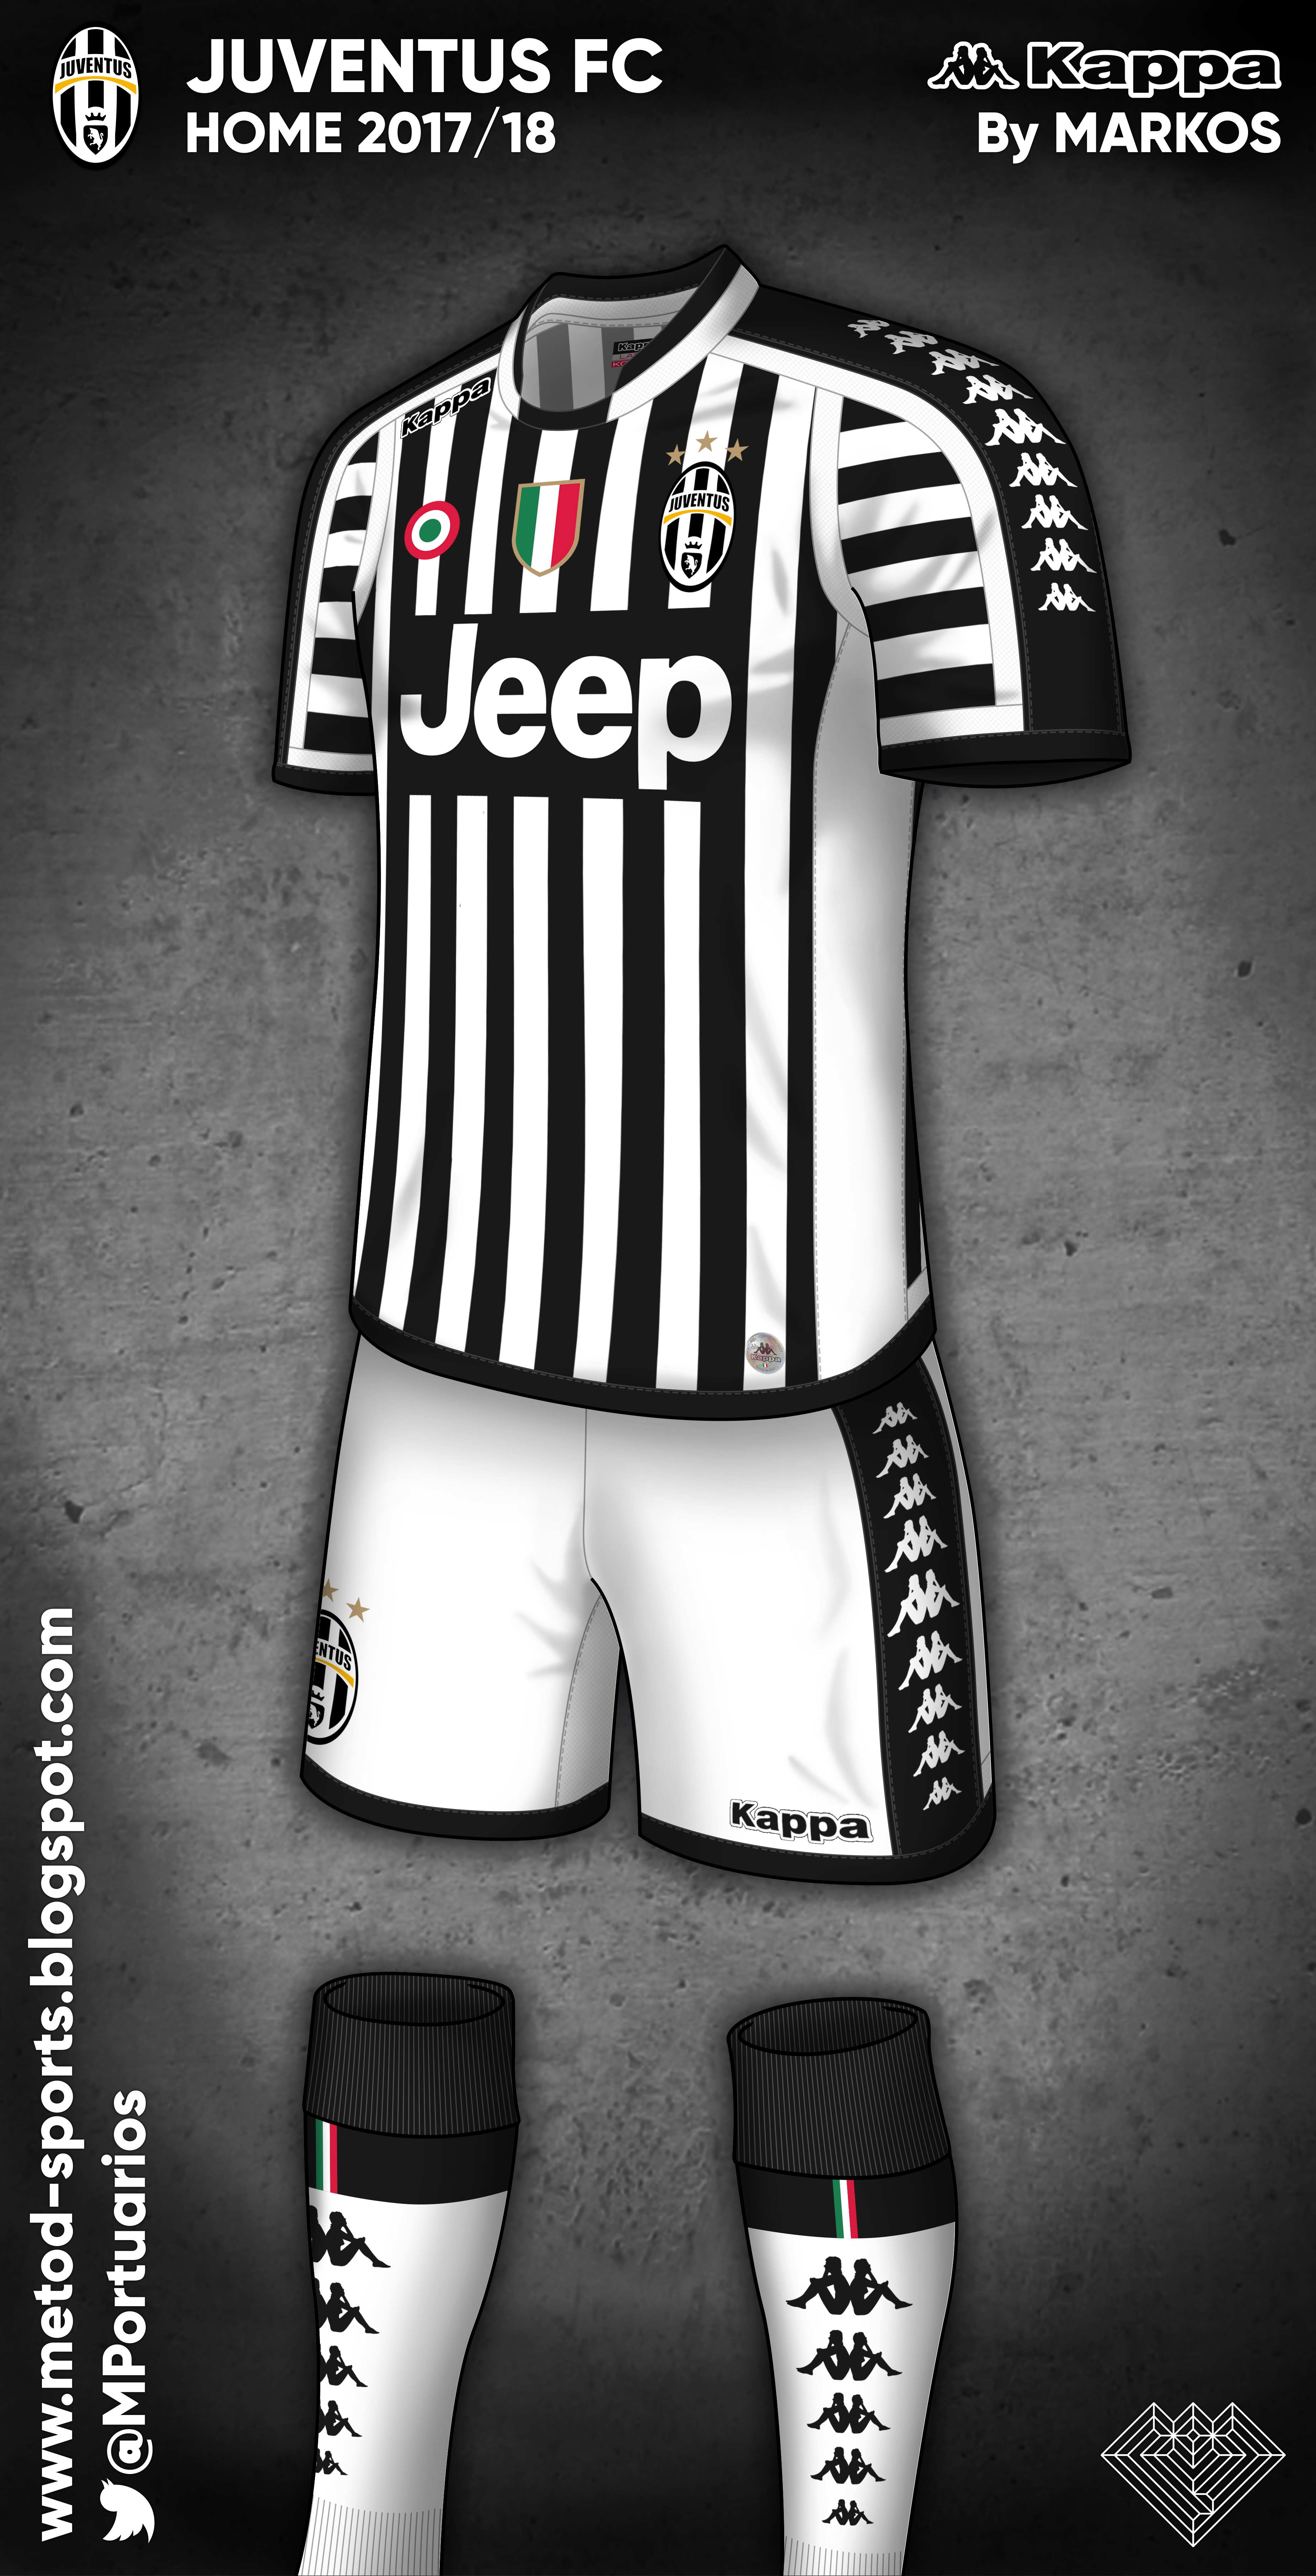 best service ca233 efb26 Juventus 17/18 Kappa